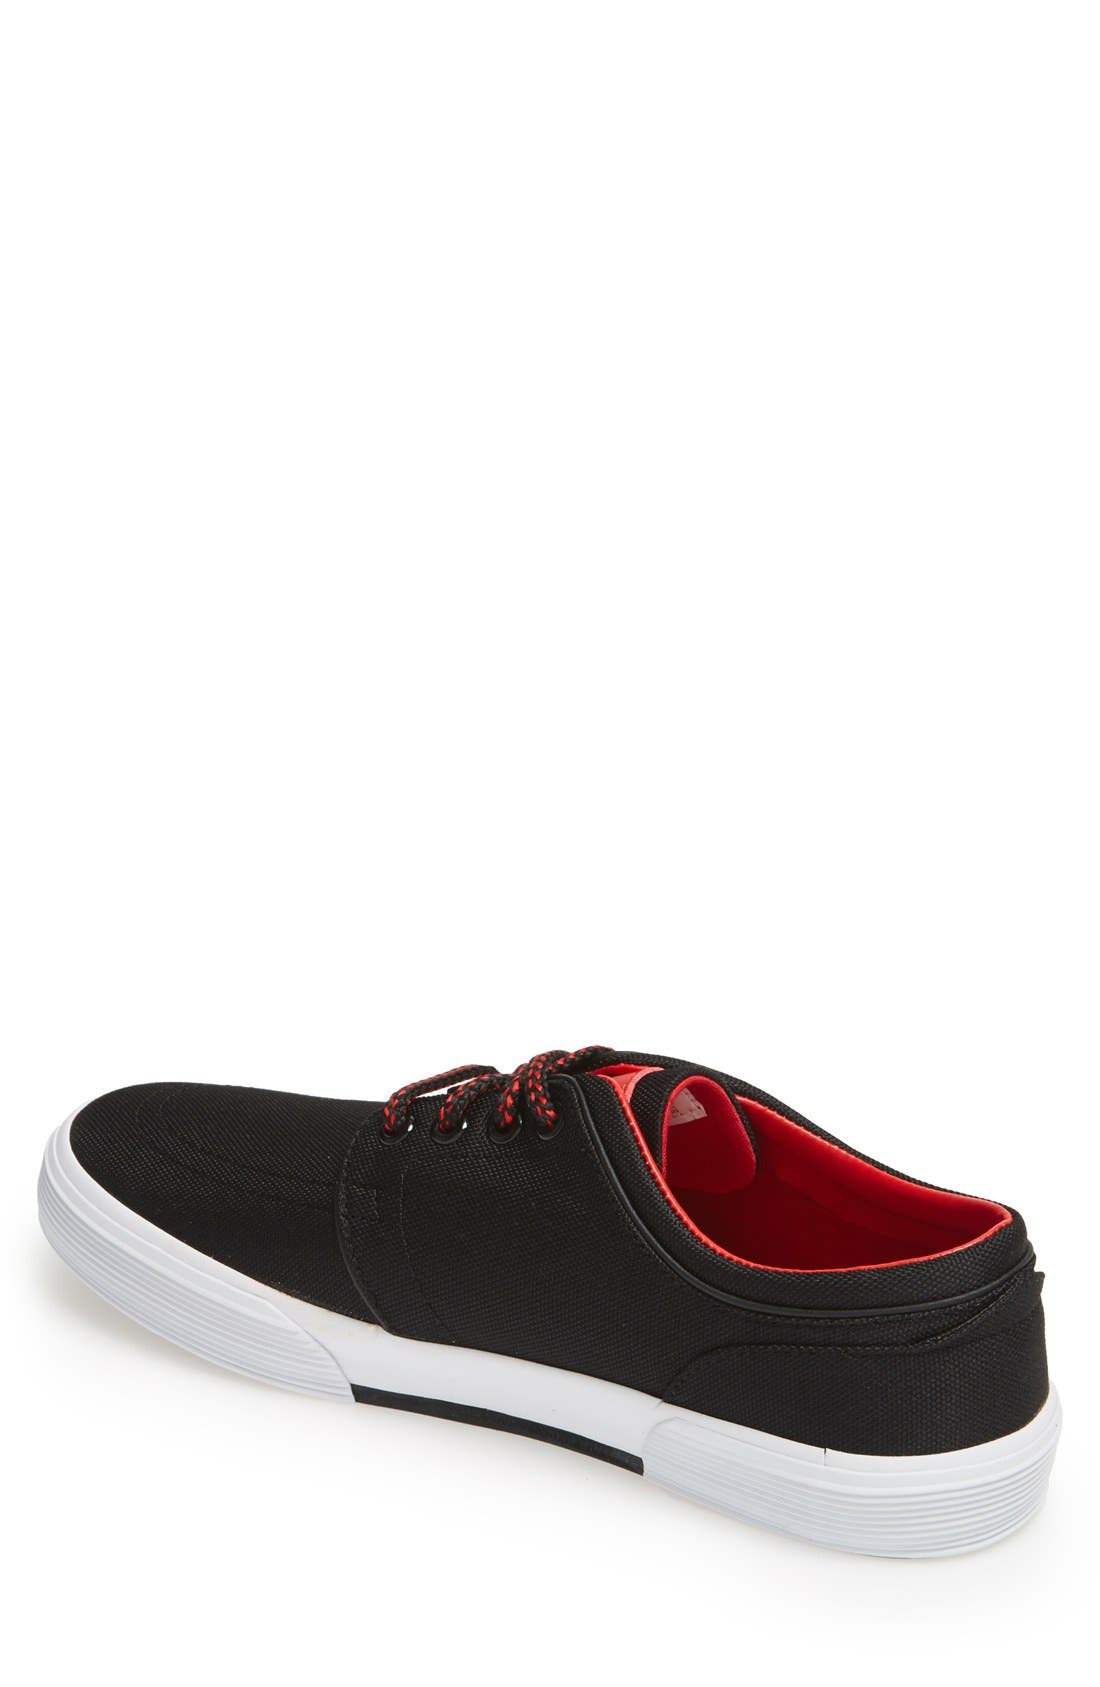 'Faxon Low' Sneaker,                             Alternate thumbnail 2, color,                             001